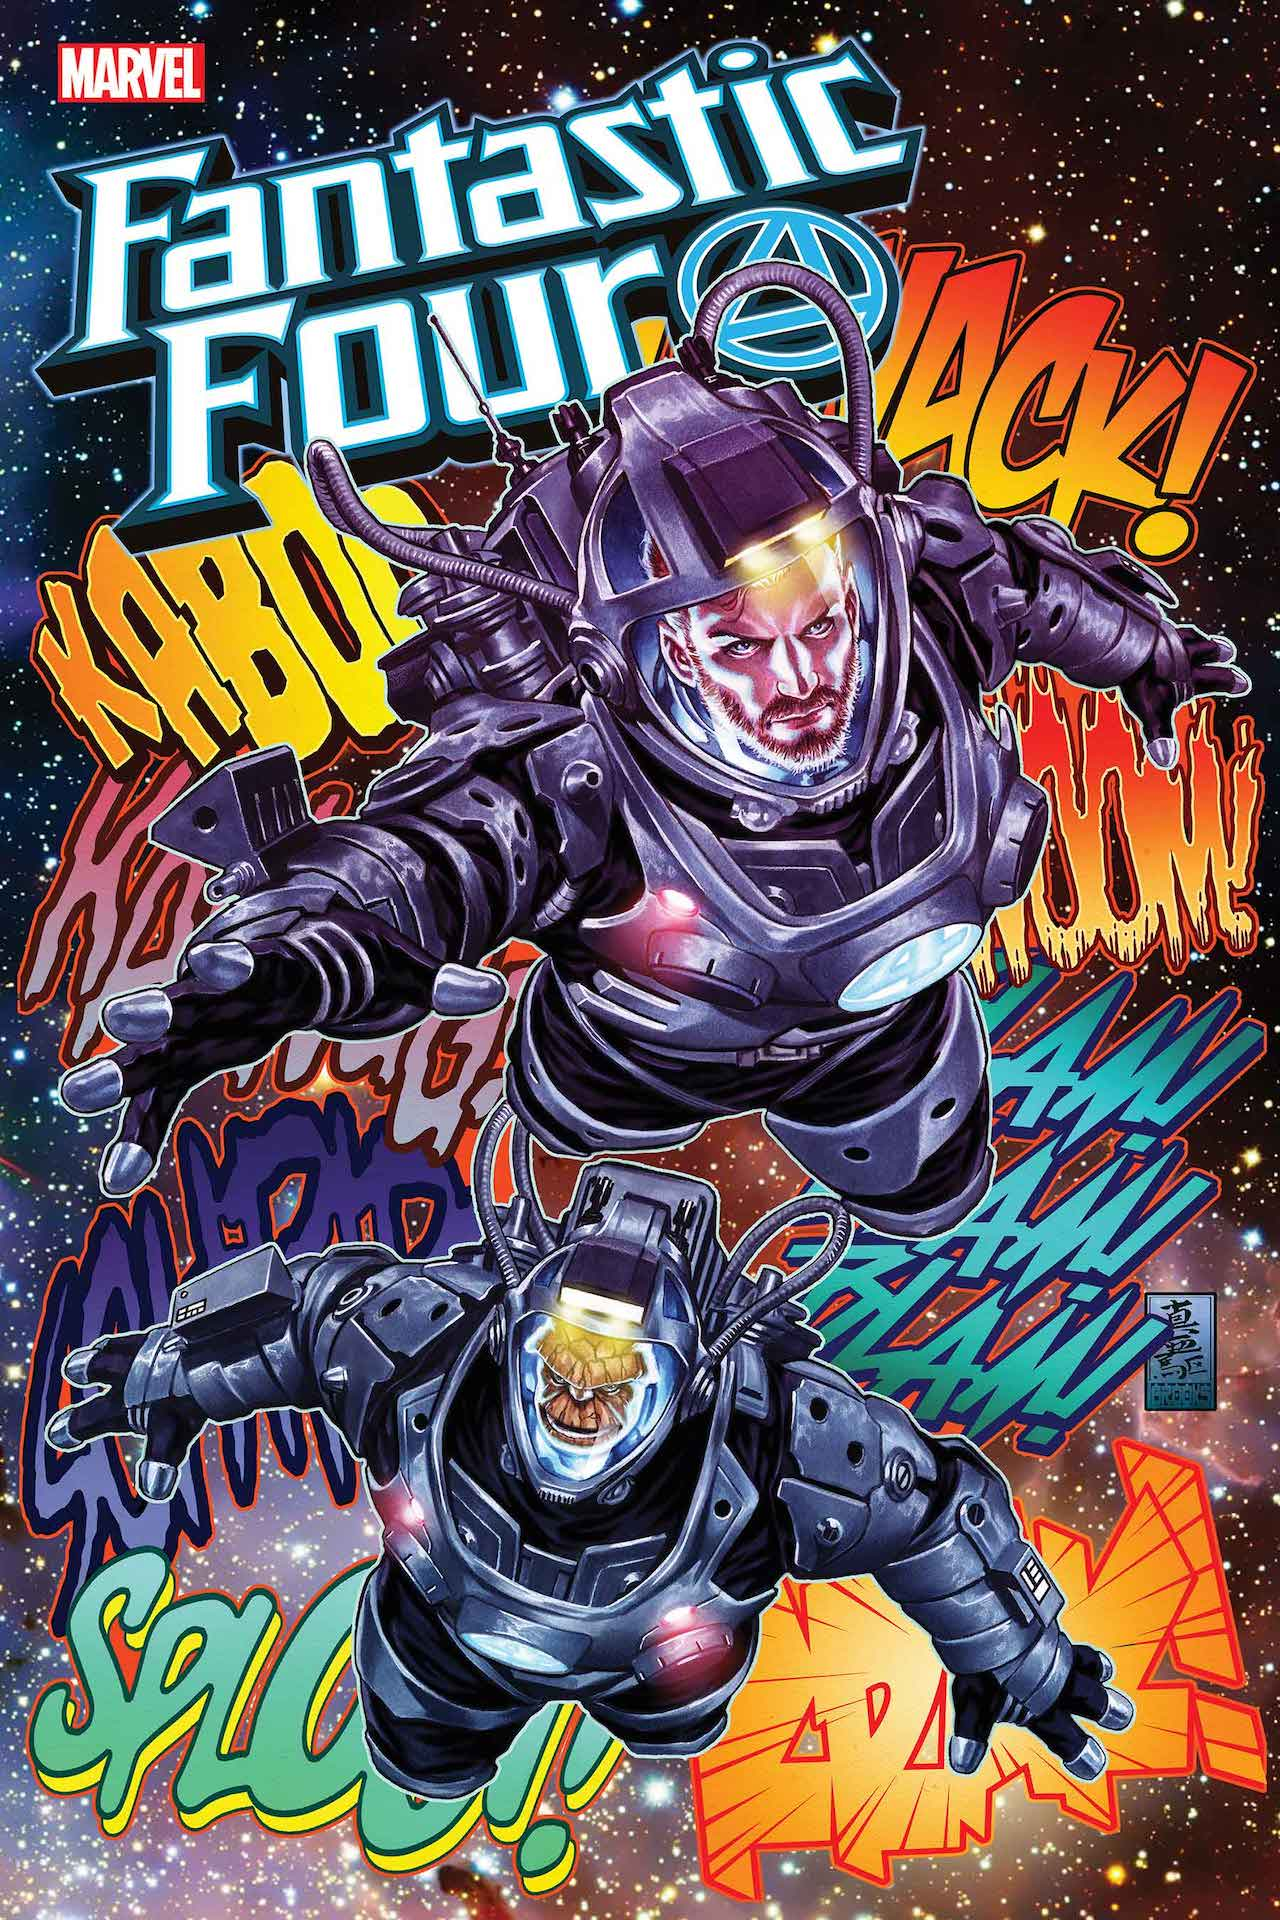 Portada de Fantastic Four # 31